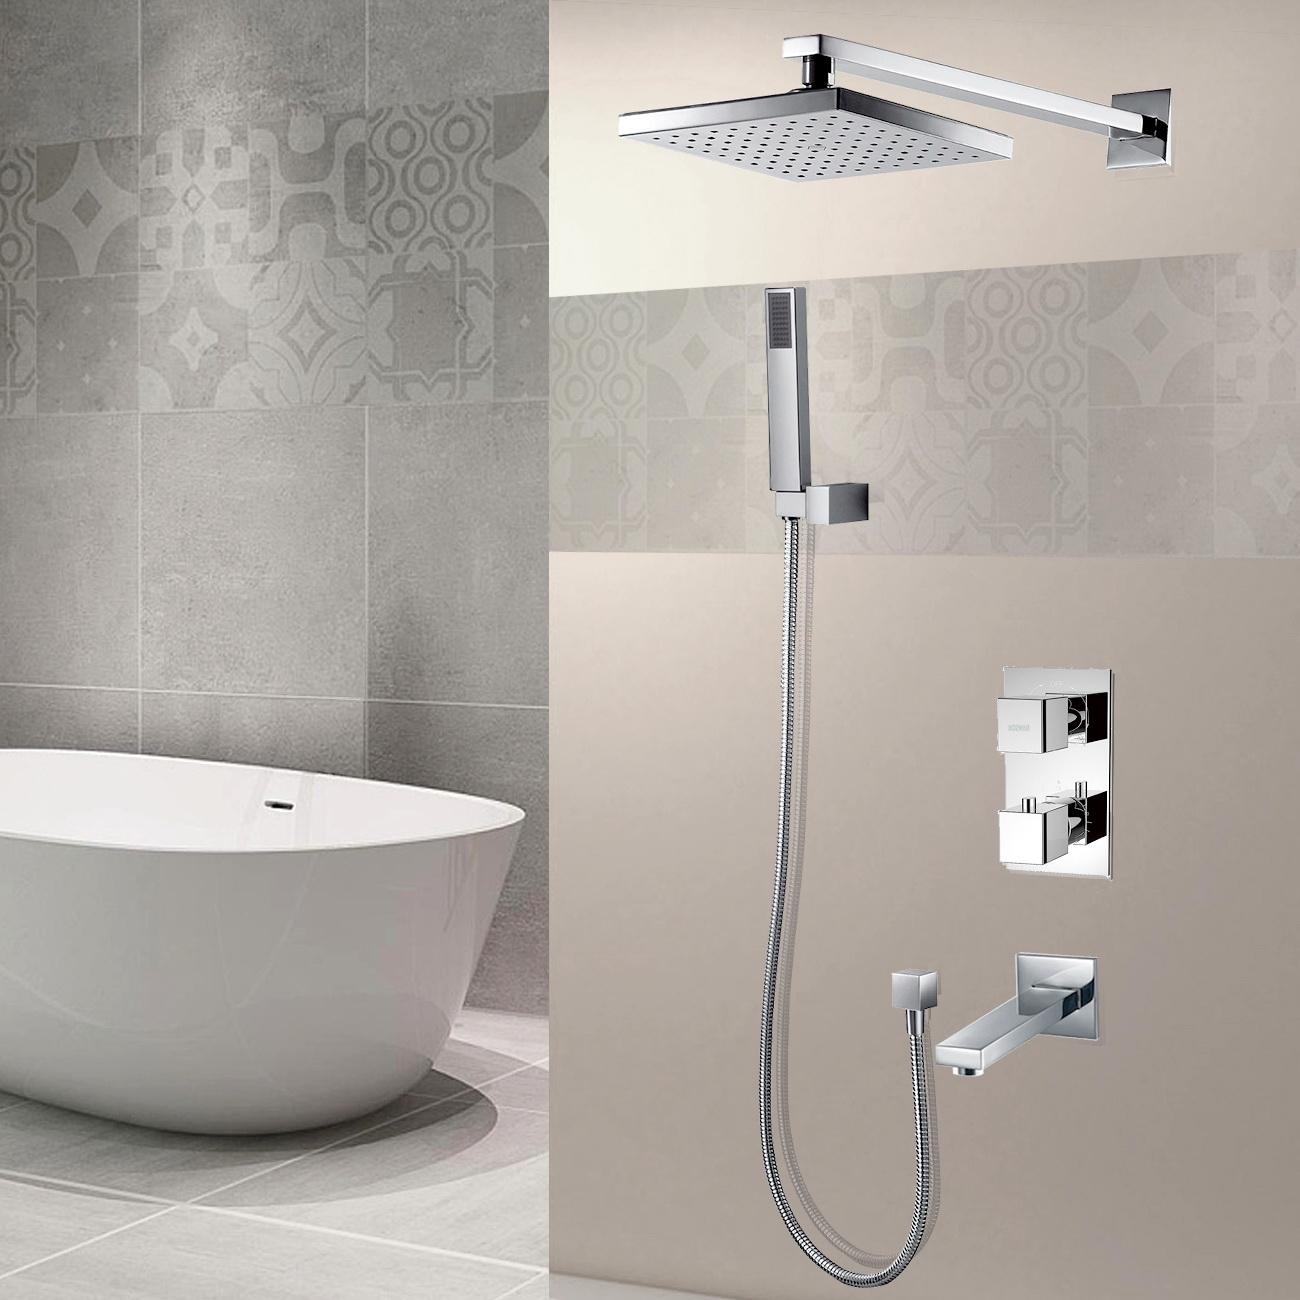 unterputz duscharmatur set thermostat regendusche brausearmatur mit 3 duschk pfe 6000000102814. Black Bedroom Furniture Sets. Home Design Ideas